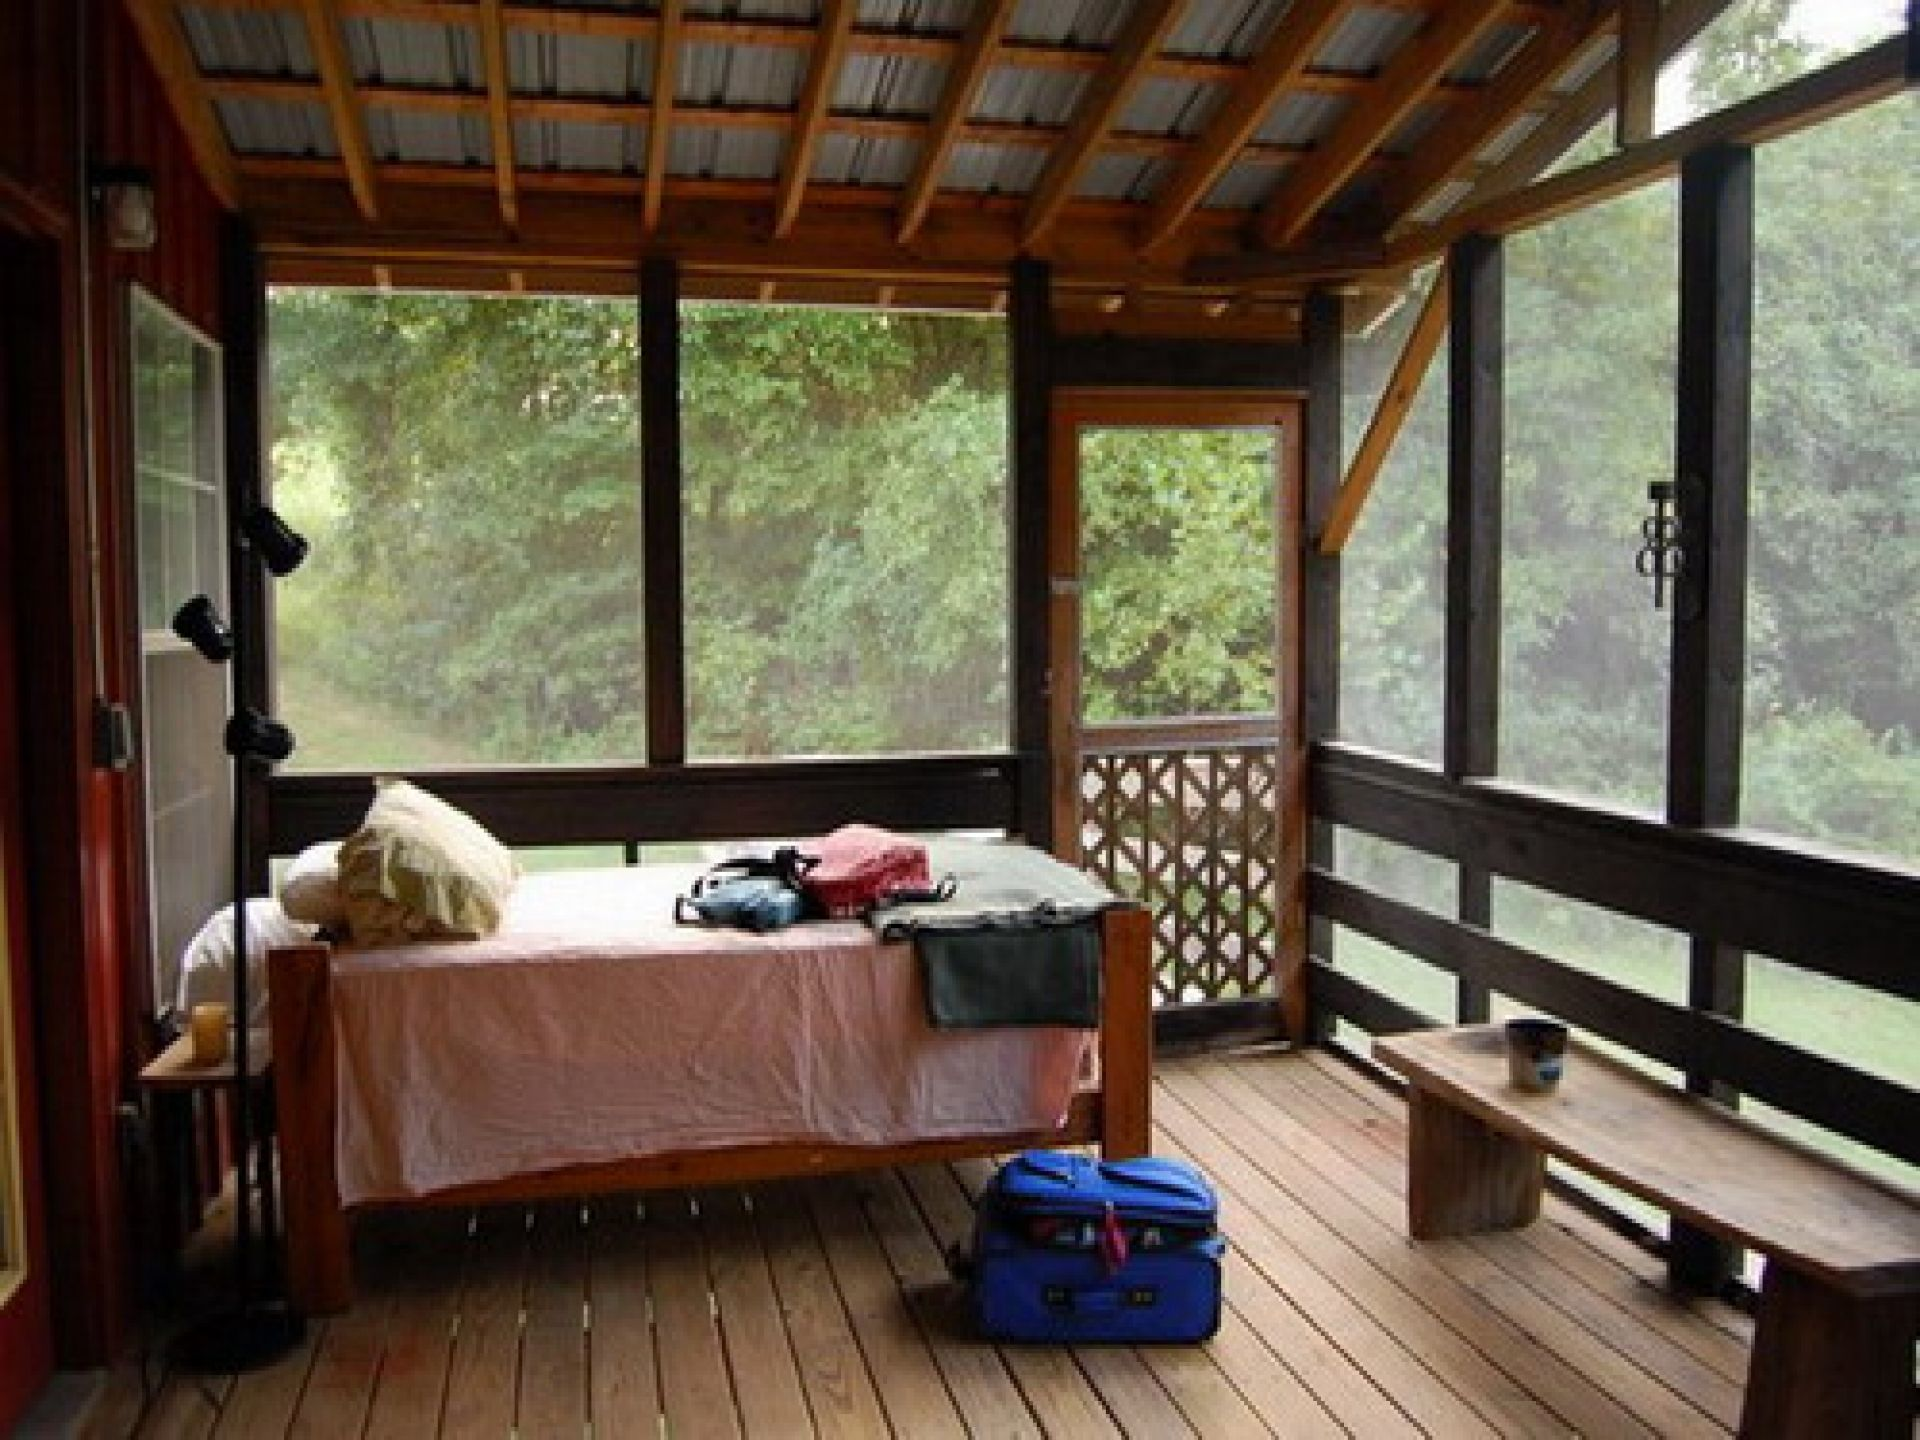 screened in porches interior designs google search - Screened In Porch Ideas Design